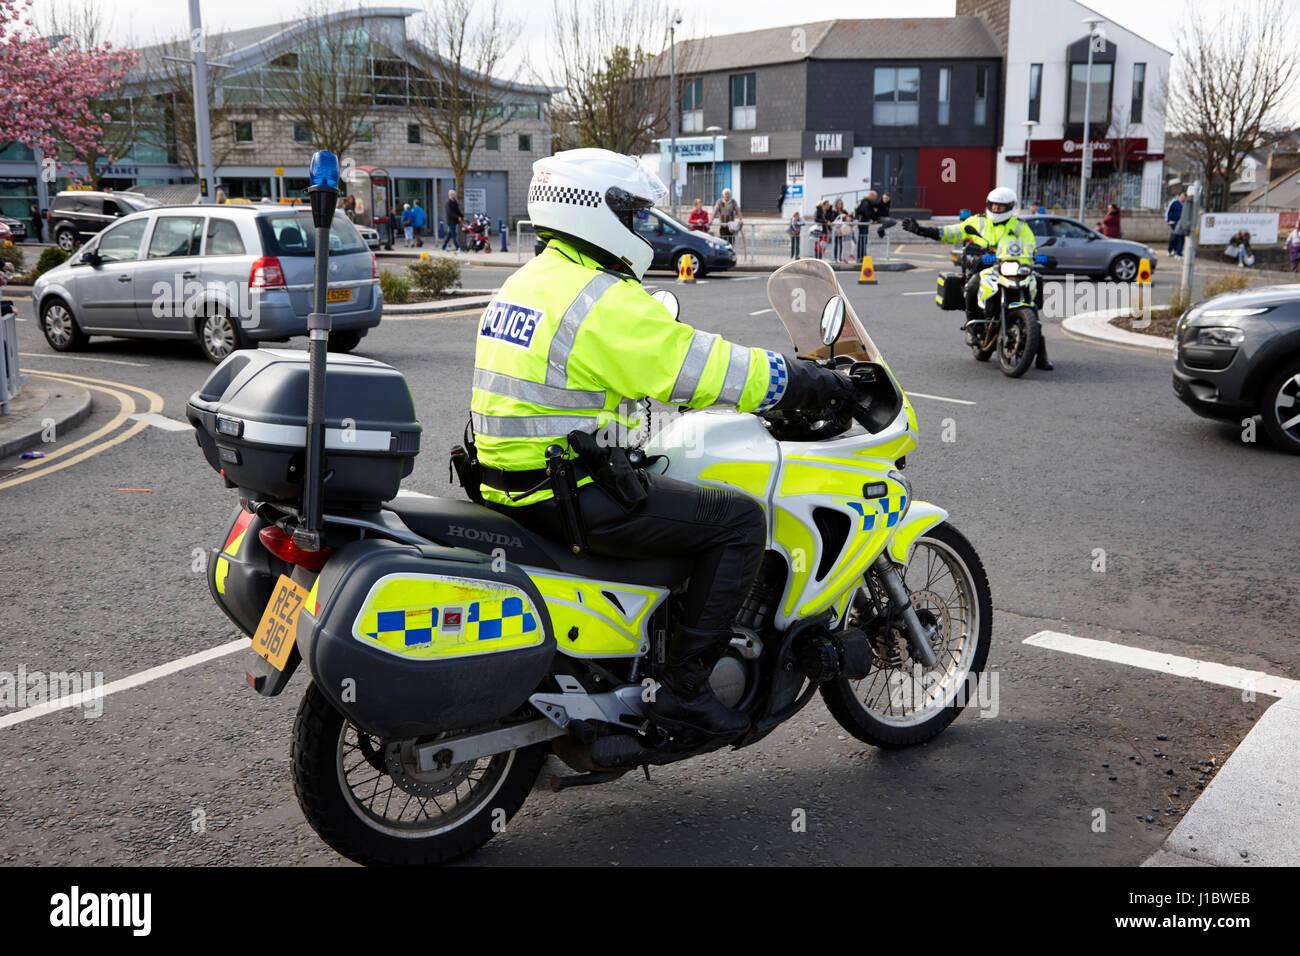 psni police officer traffic police on honda motorbike directing traffic at roundabout northern ireland - Stock Image